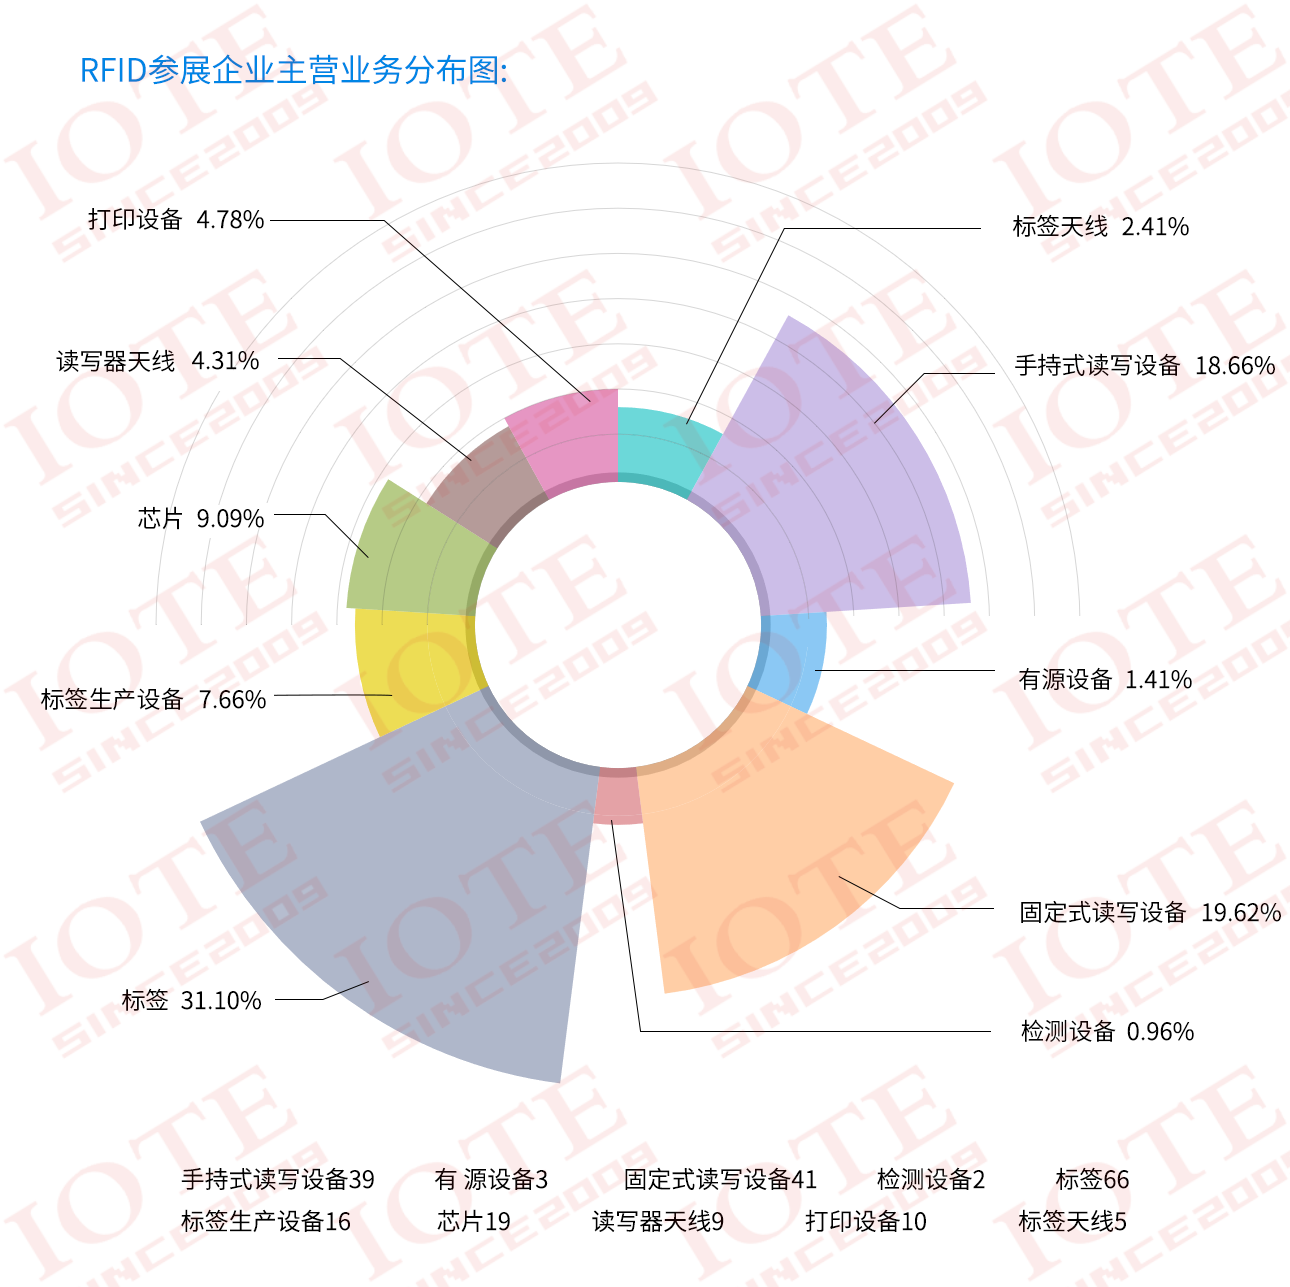 RFID主营业务分布图.png